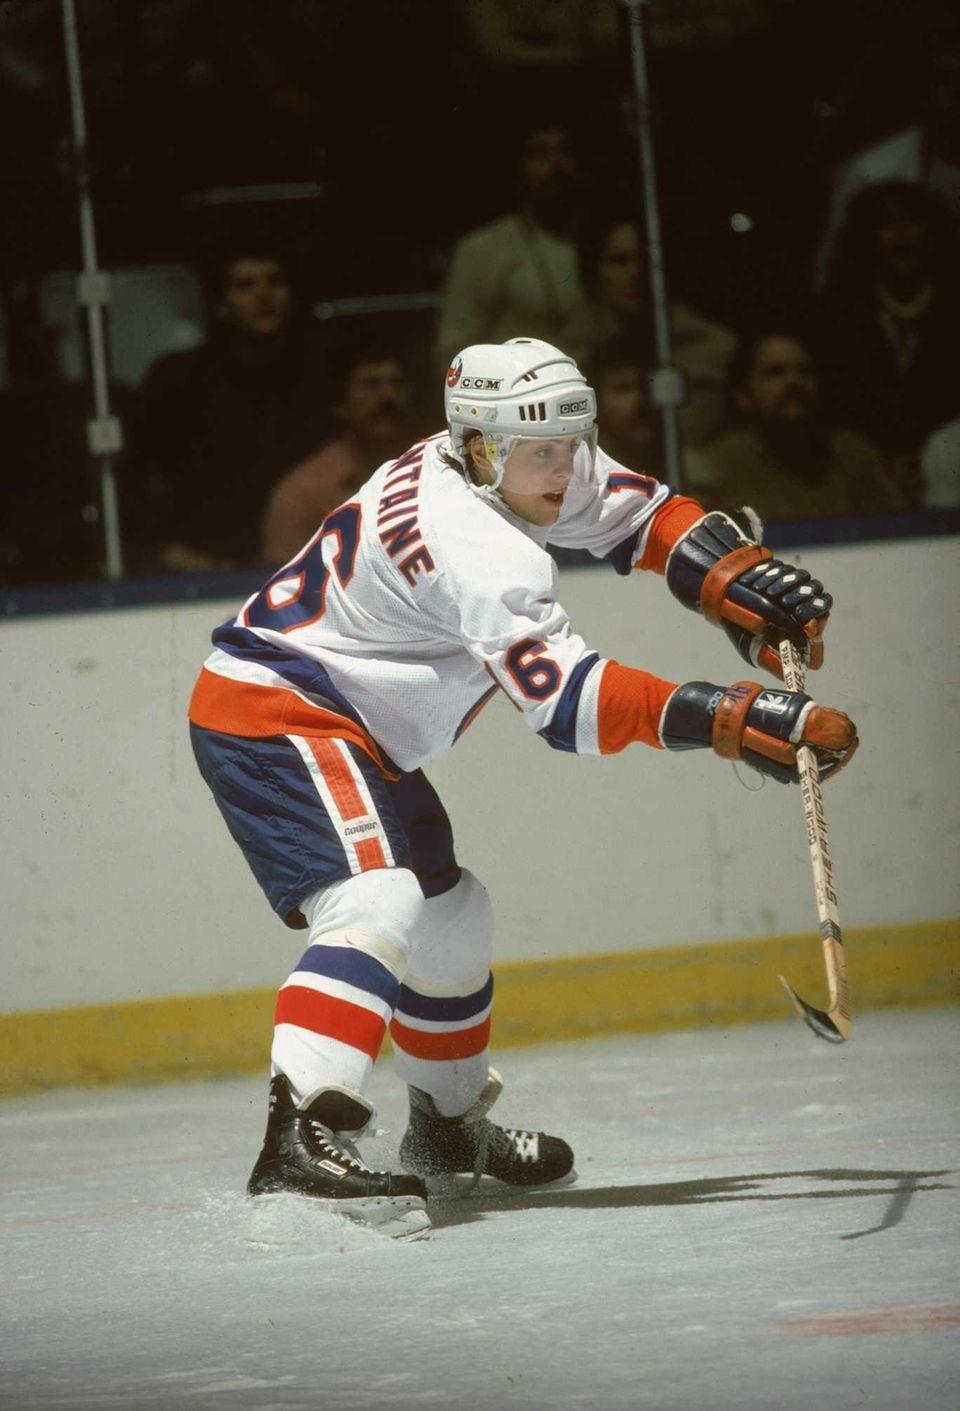 PAT LAFONTAINE, Center Islanders (1983-1991): 530 games, 287